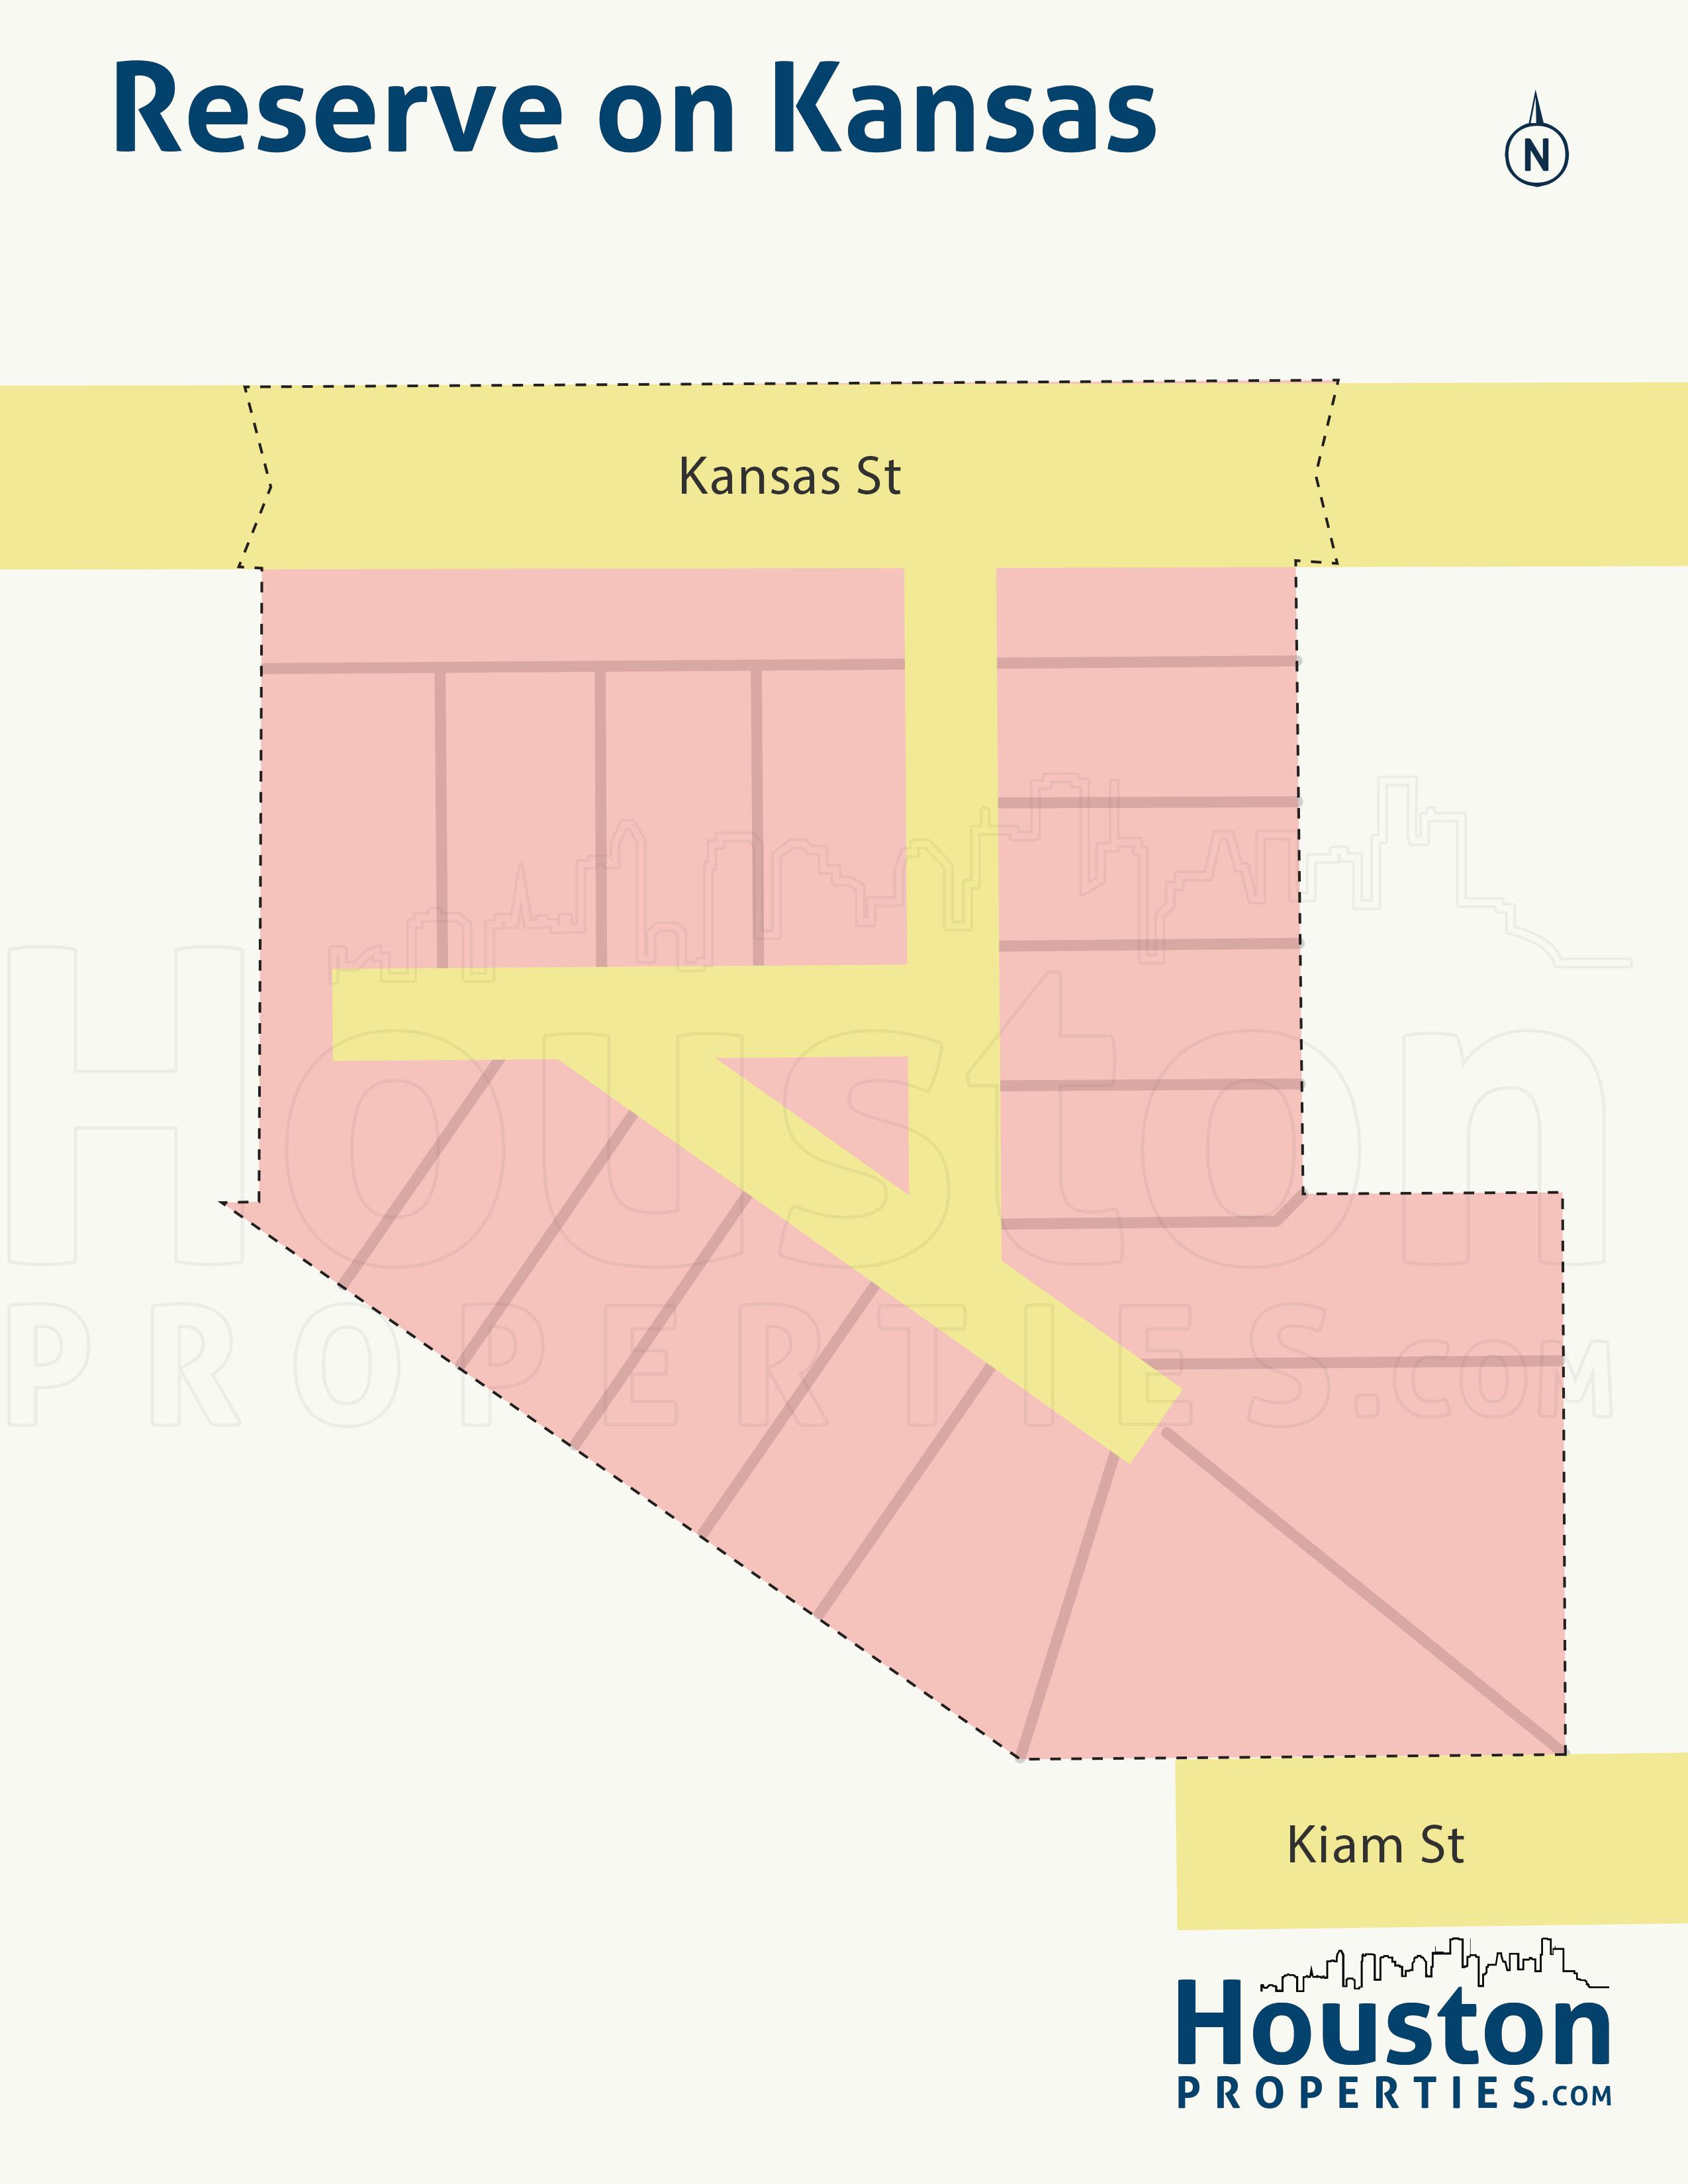 Reserve on Kansas neighborhood map